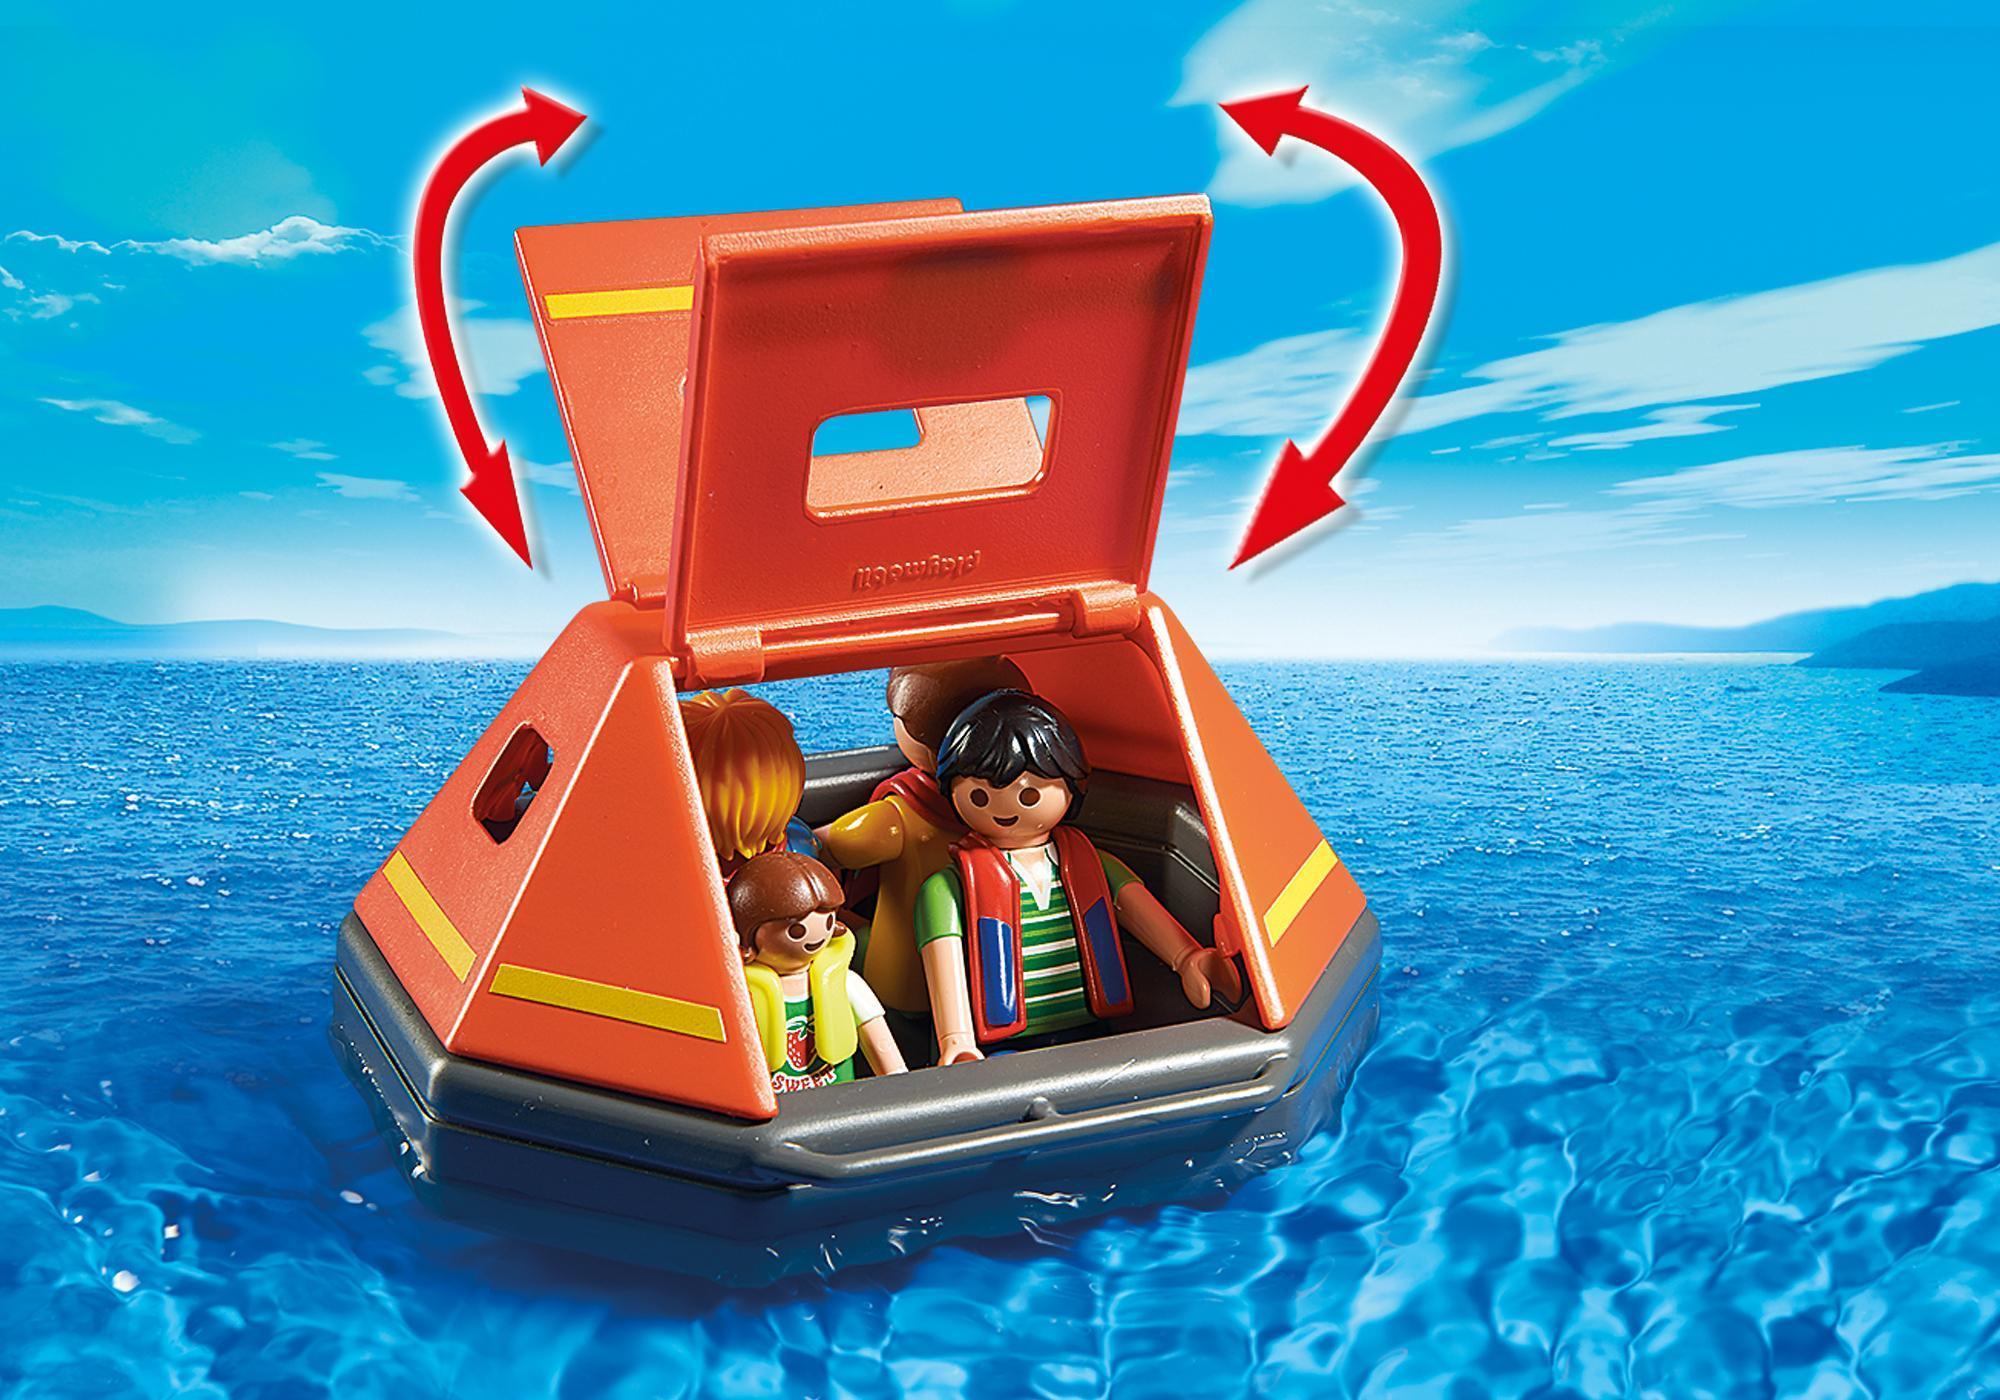 http://media.playmobil.com/i/playmobil/5545_product_extra2/Rettungsinsel